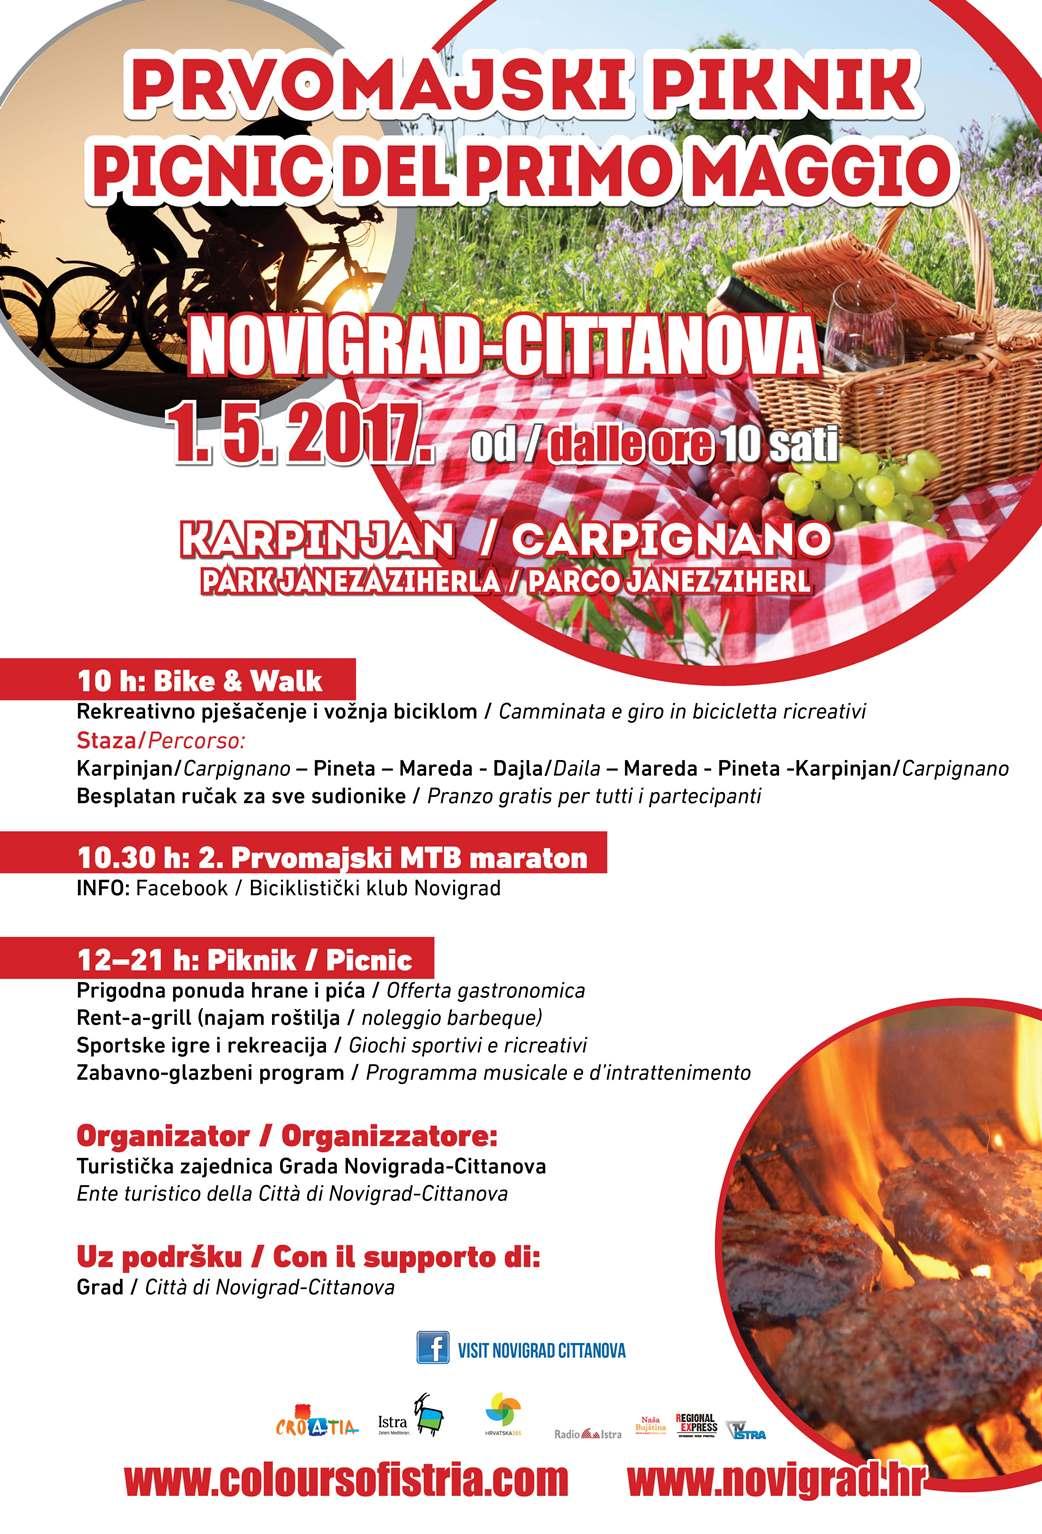 http://www.novigrad.hr/prvomajski_piknik